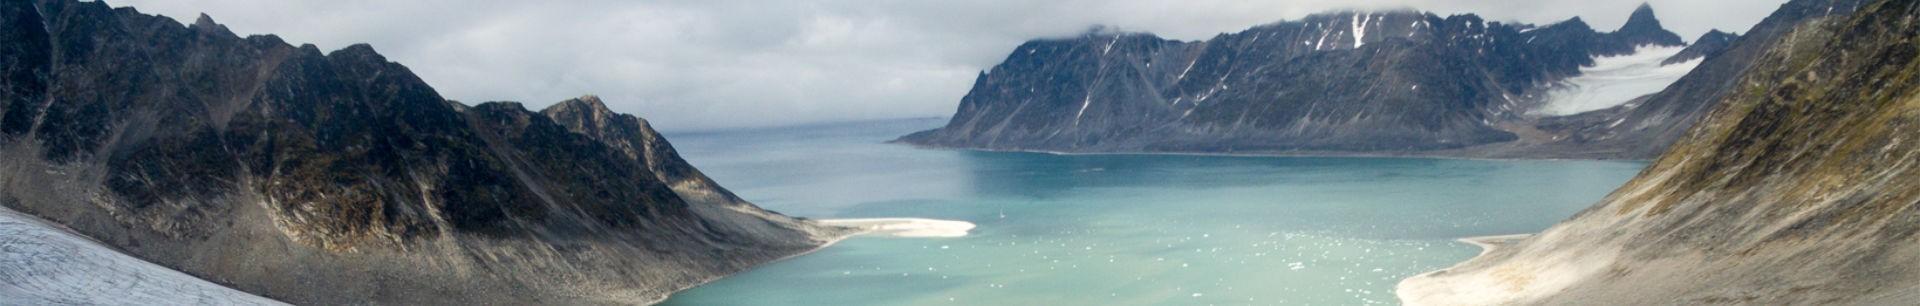 Zoom presentations - Rolf Stange - Spitsbergen-Shop